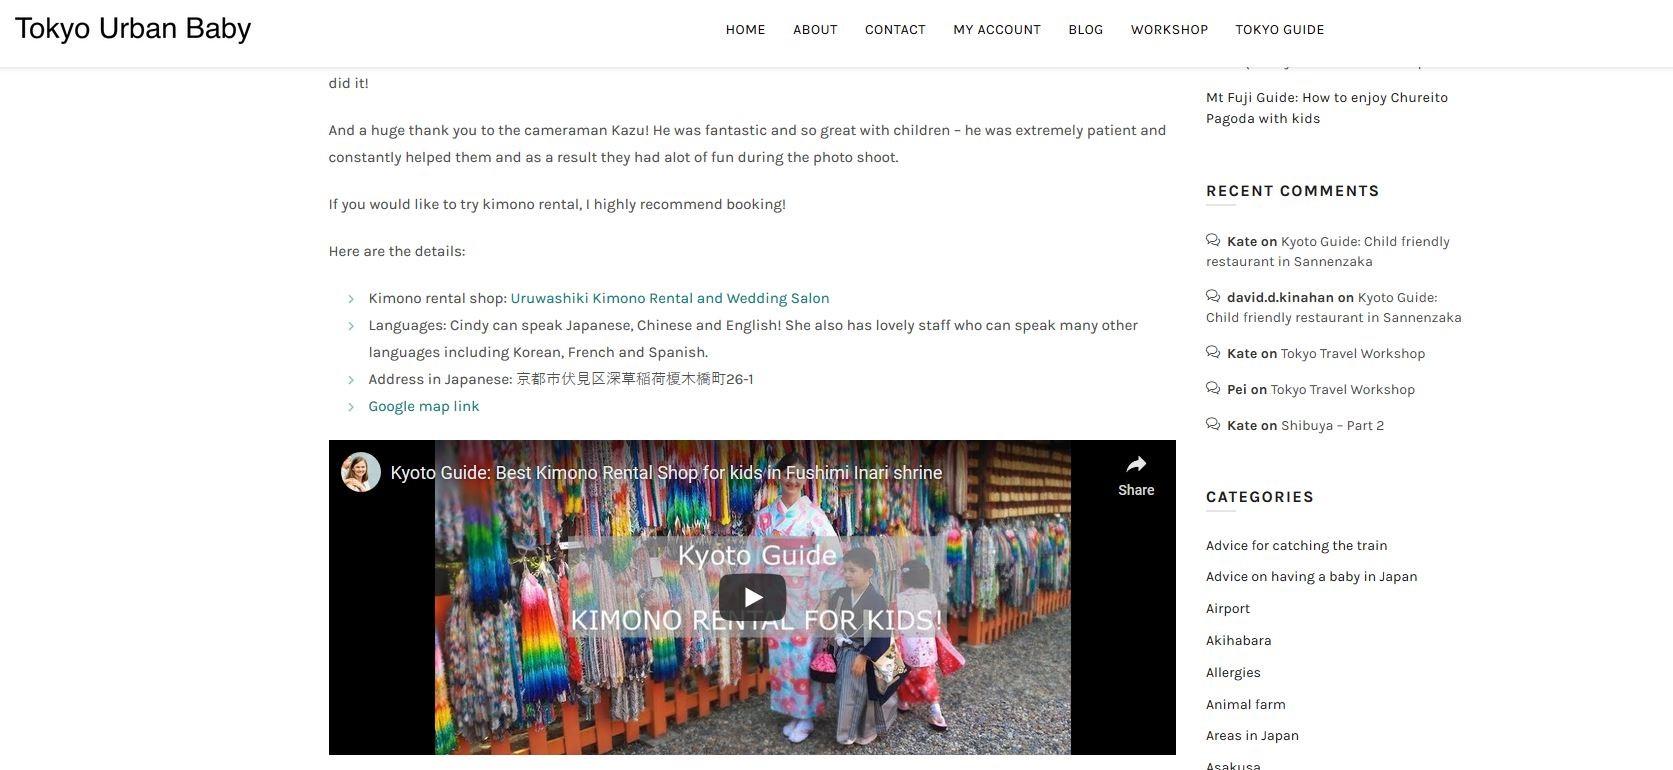 Tokyo Urban Baby website